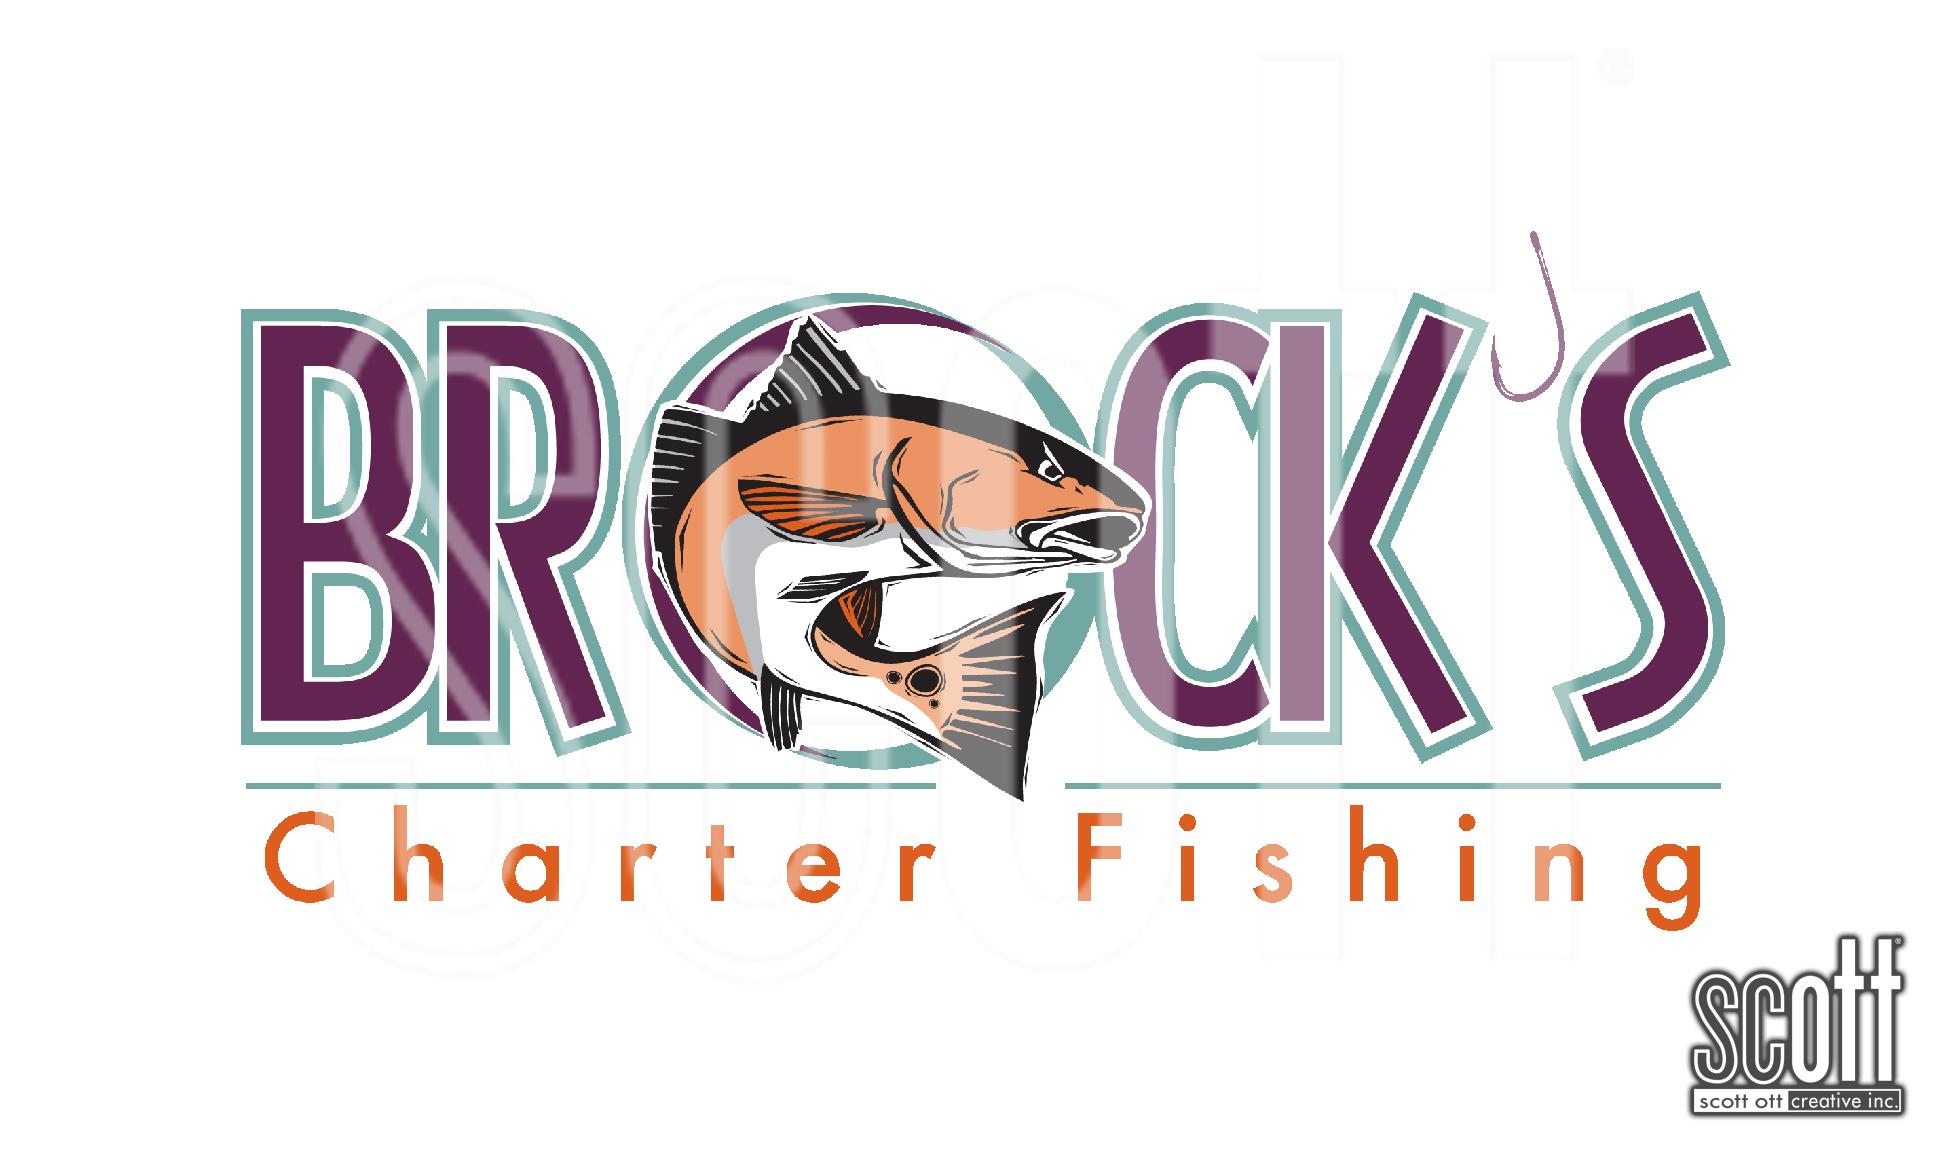 Brock's Charter Fishing BROCK COLOR